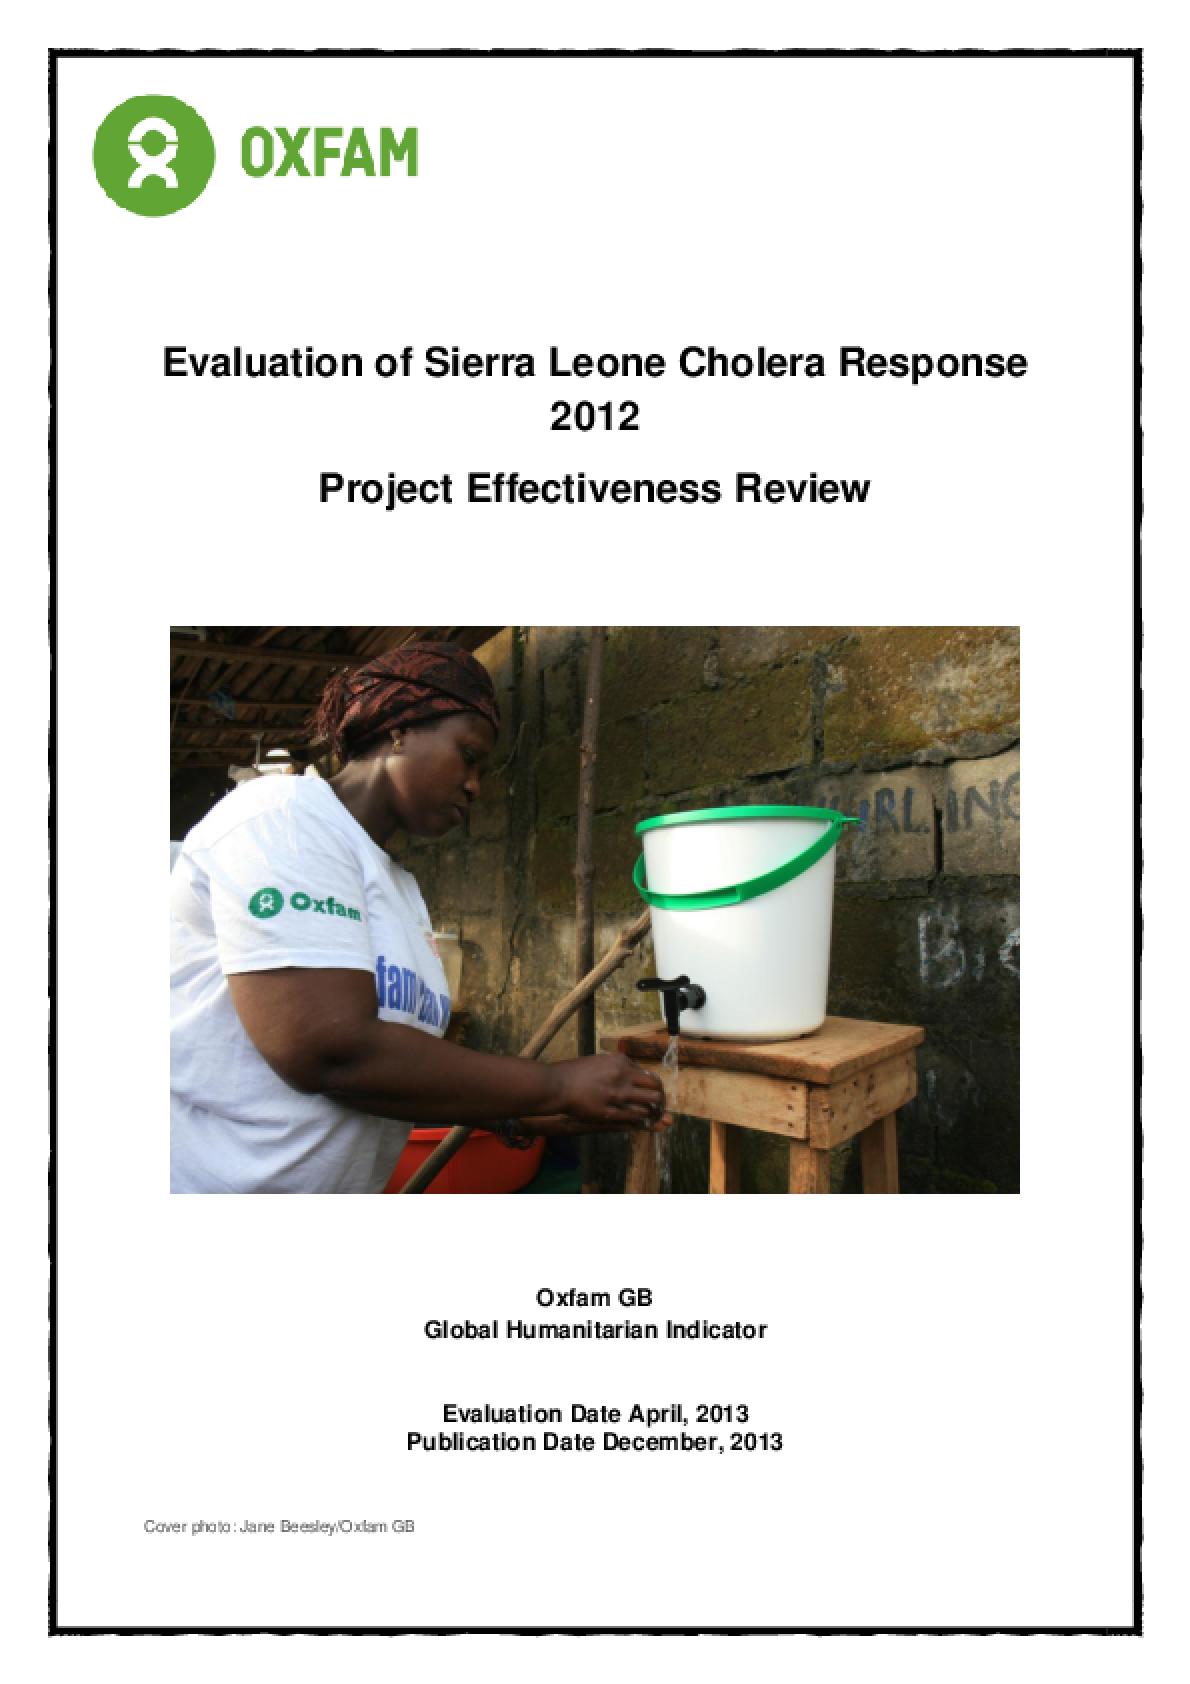 Effectiveness Review: Cholera Response Sierra Leone 2012/13